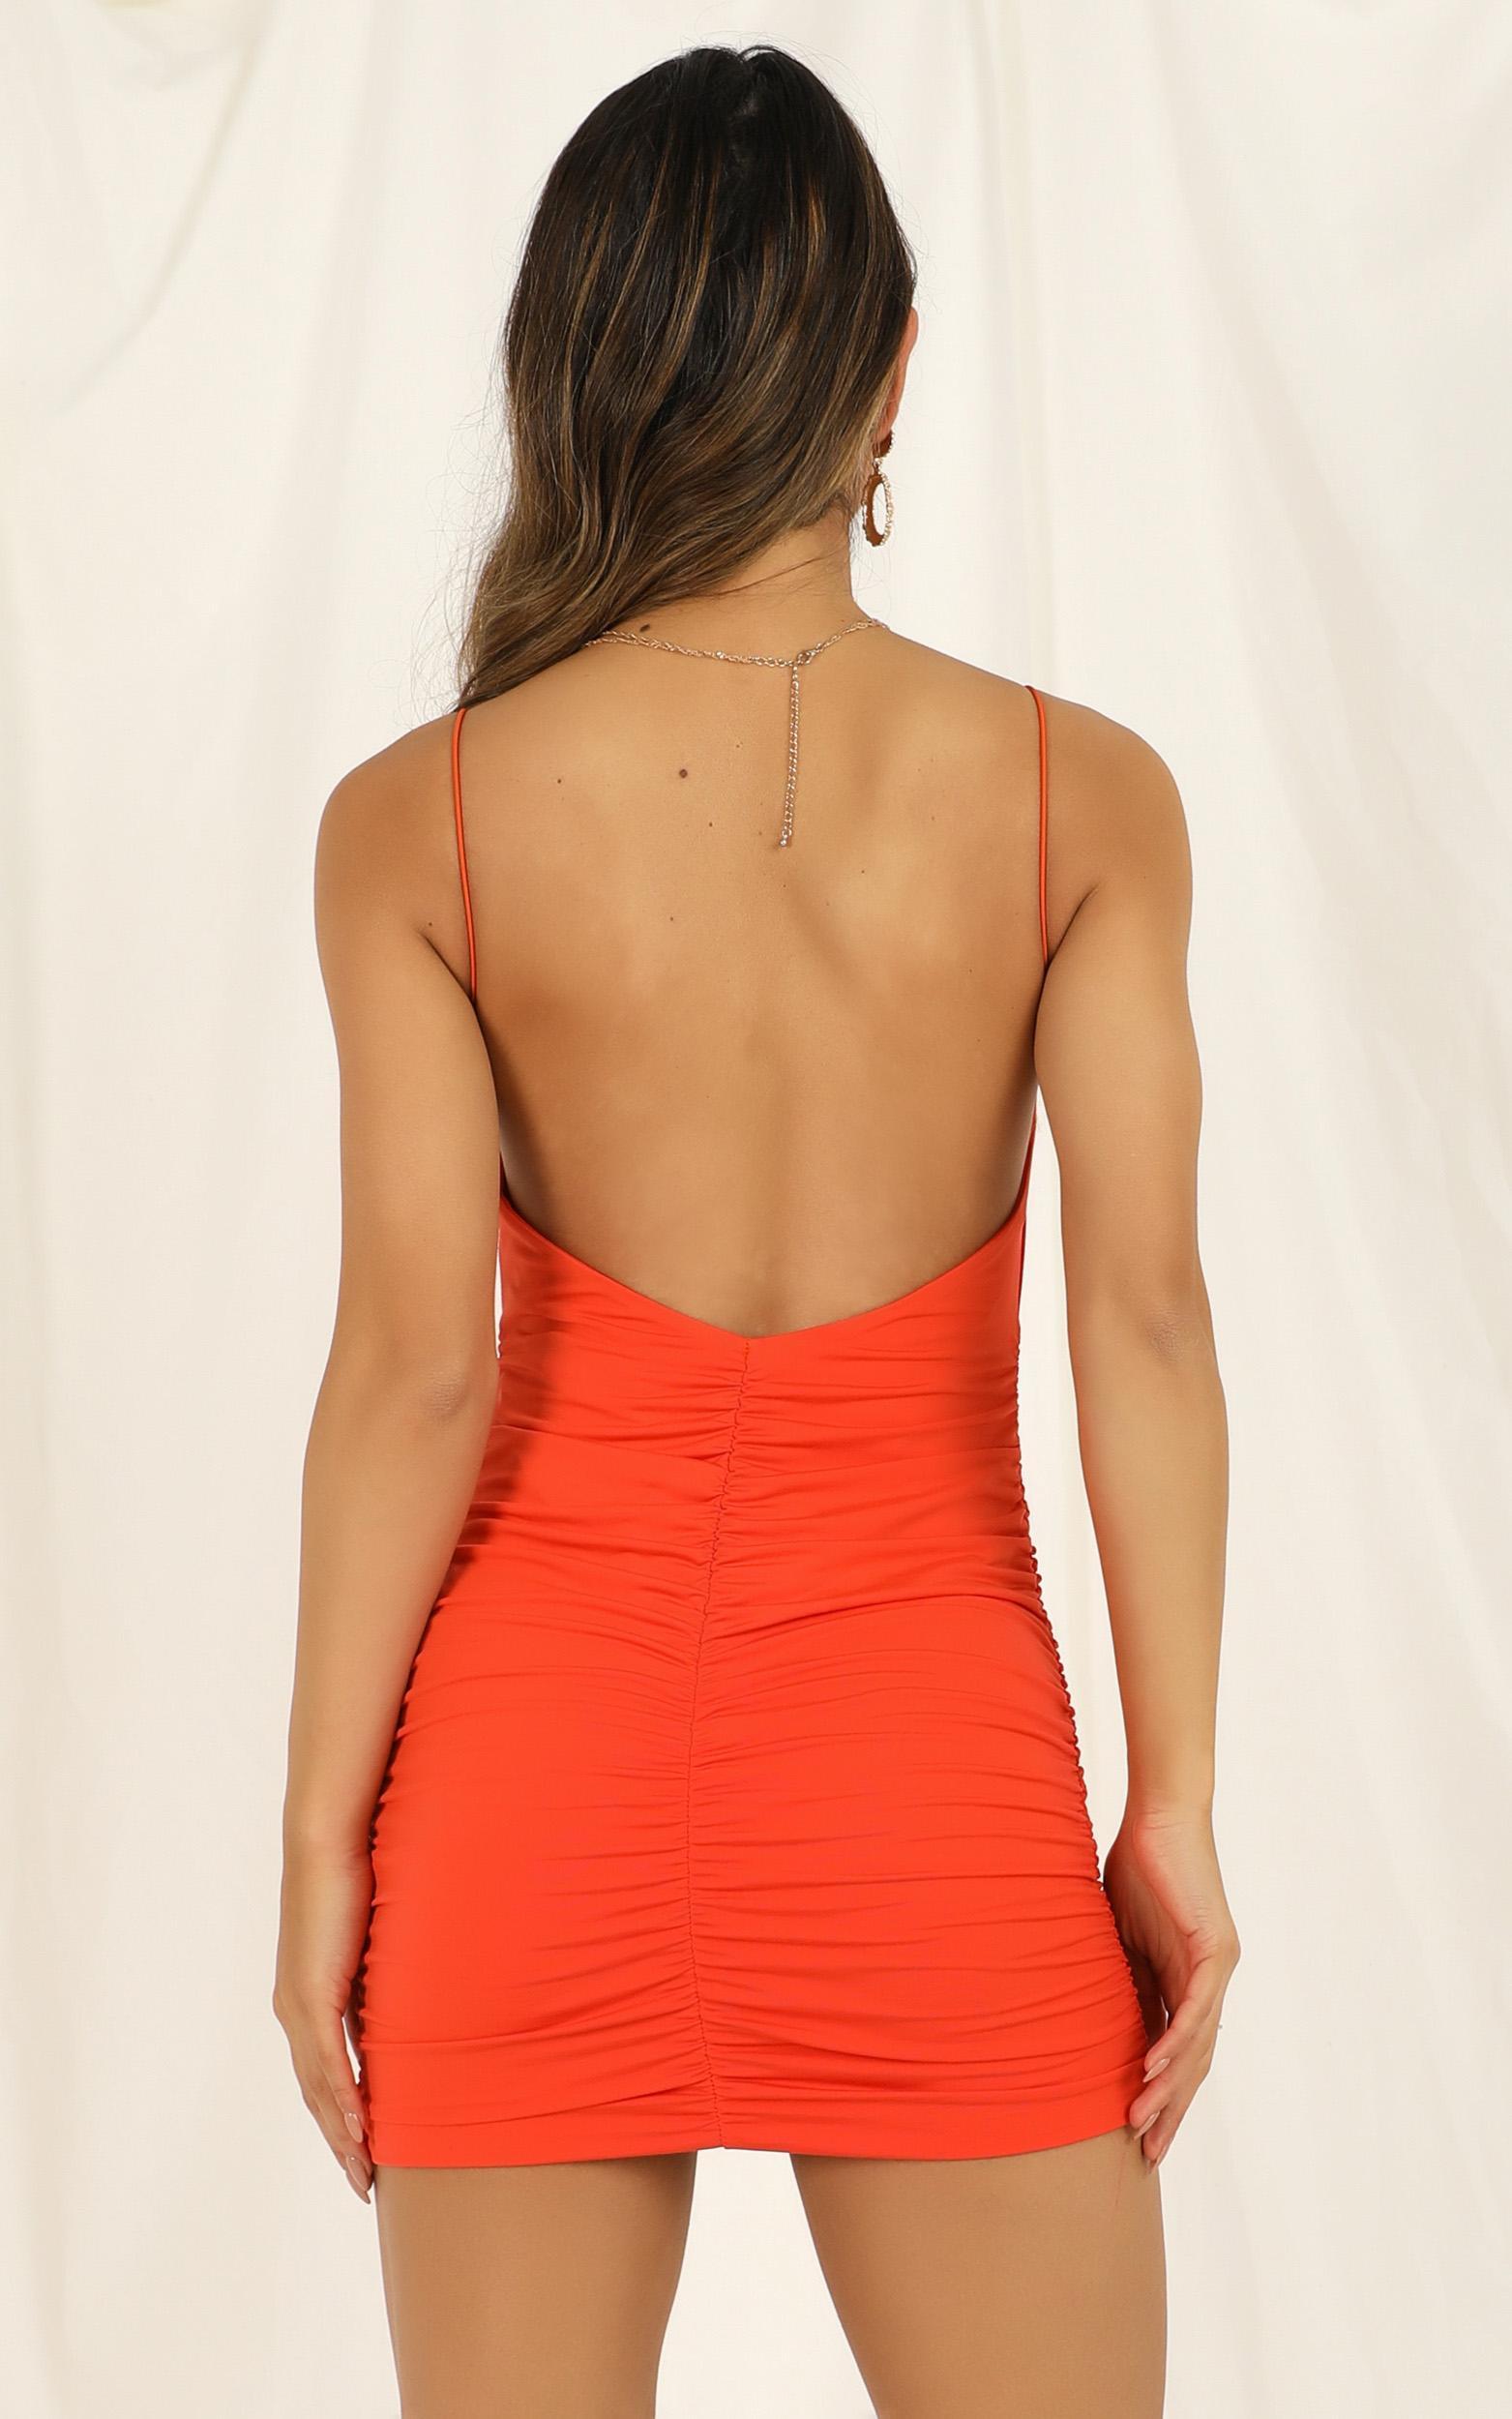 World Of Love Dress In tangerine - 16 (XXL), Orange, hi-res image number null